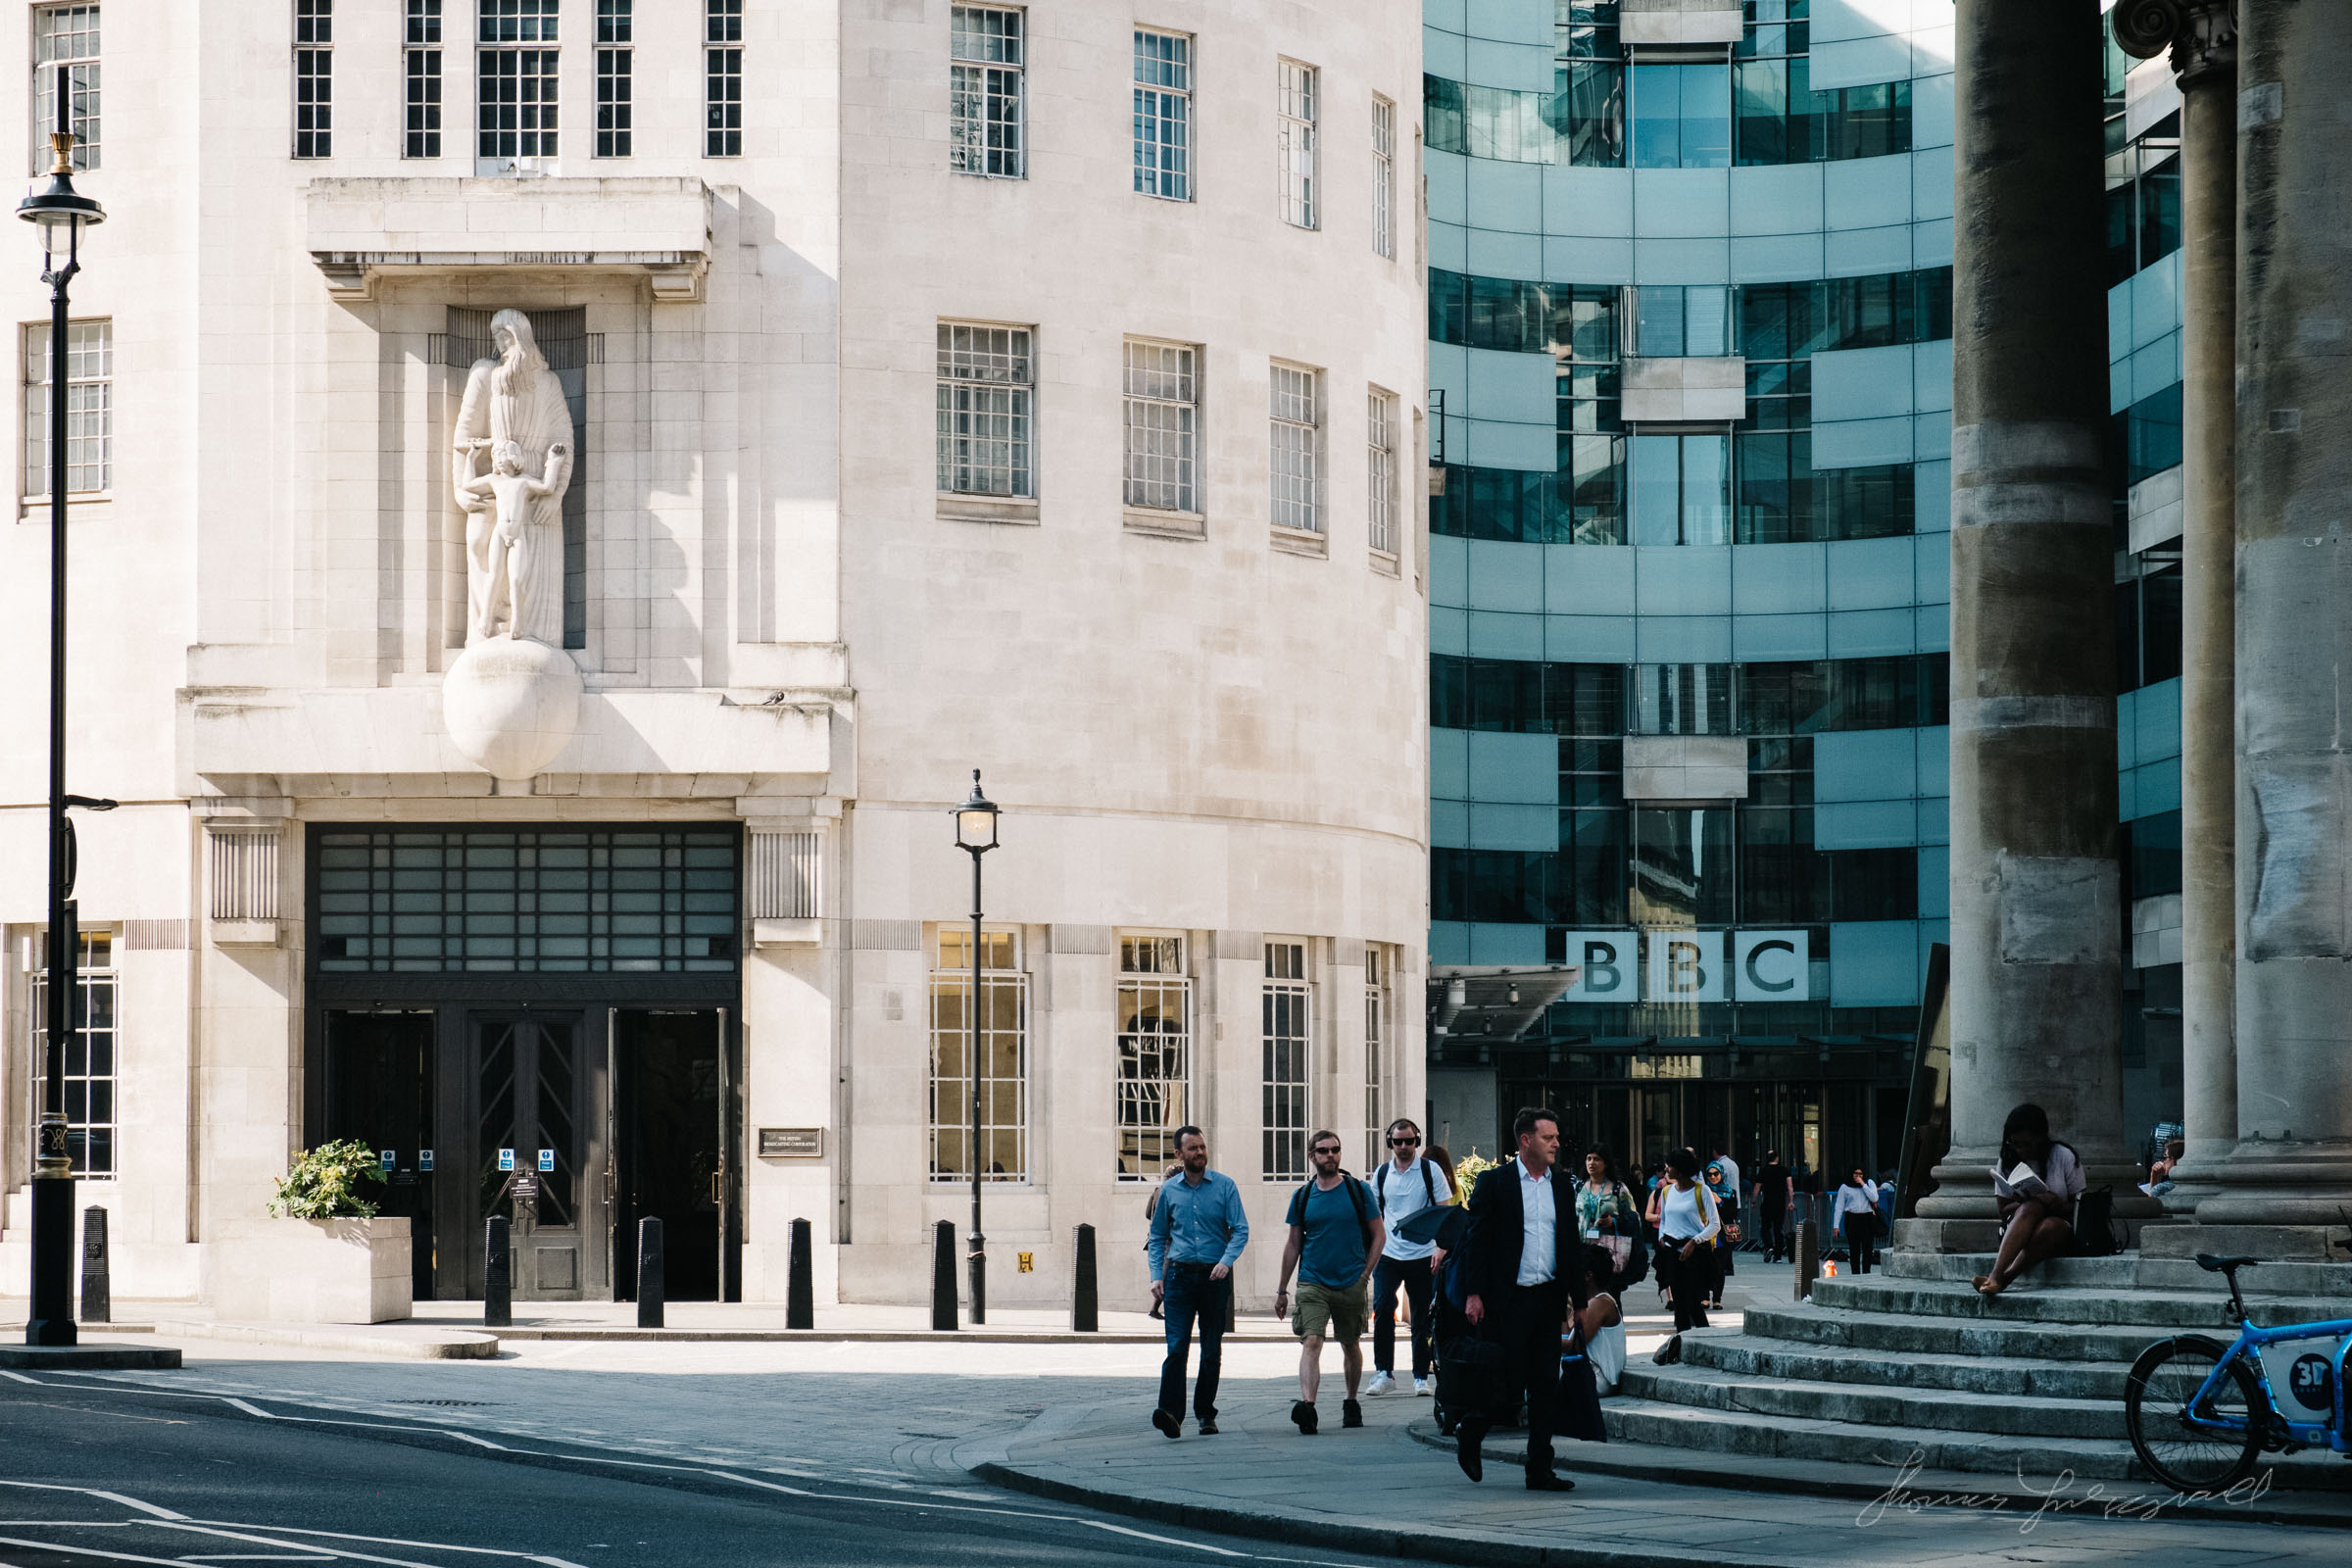 BBC building in London